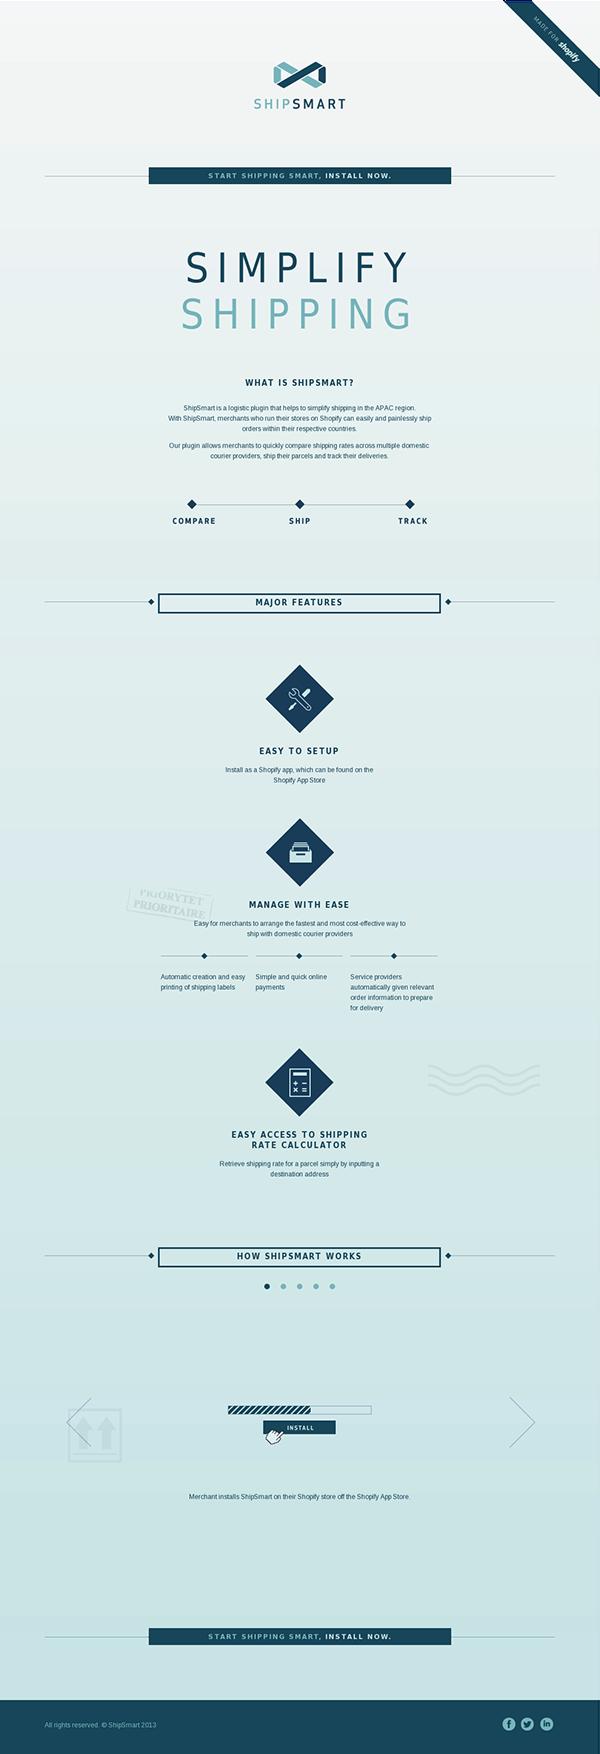 shipping,Shopify,Theme,HTML,html5,css3,minimalistic,design,Web,Layout